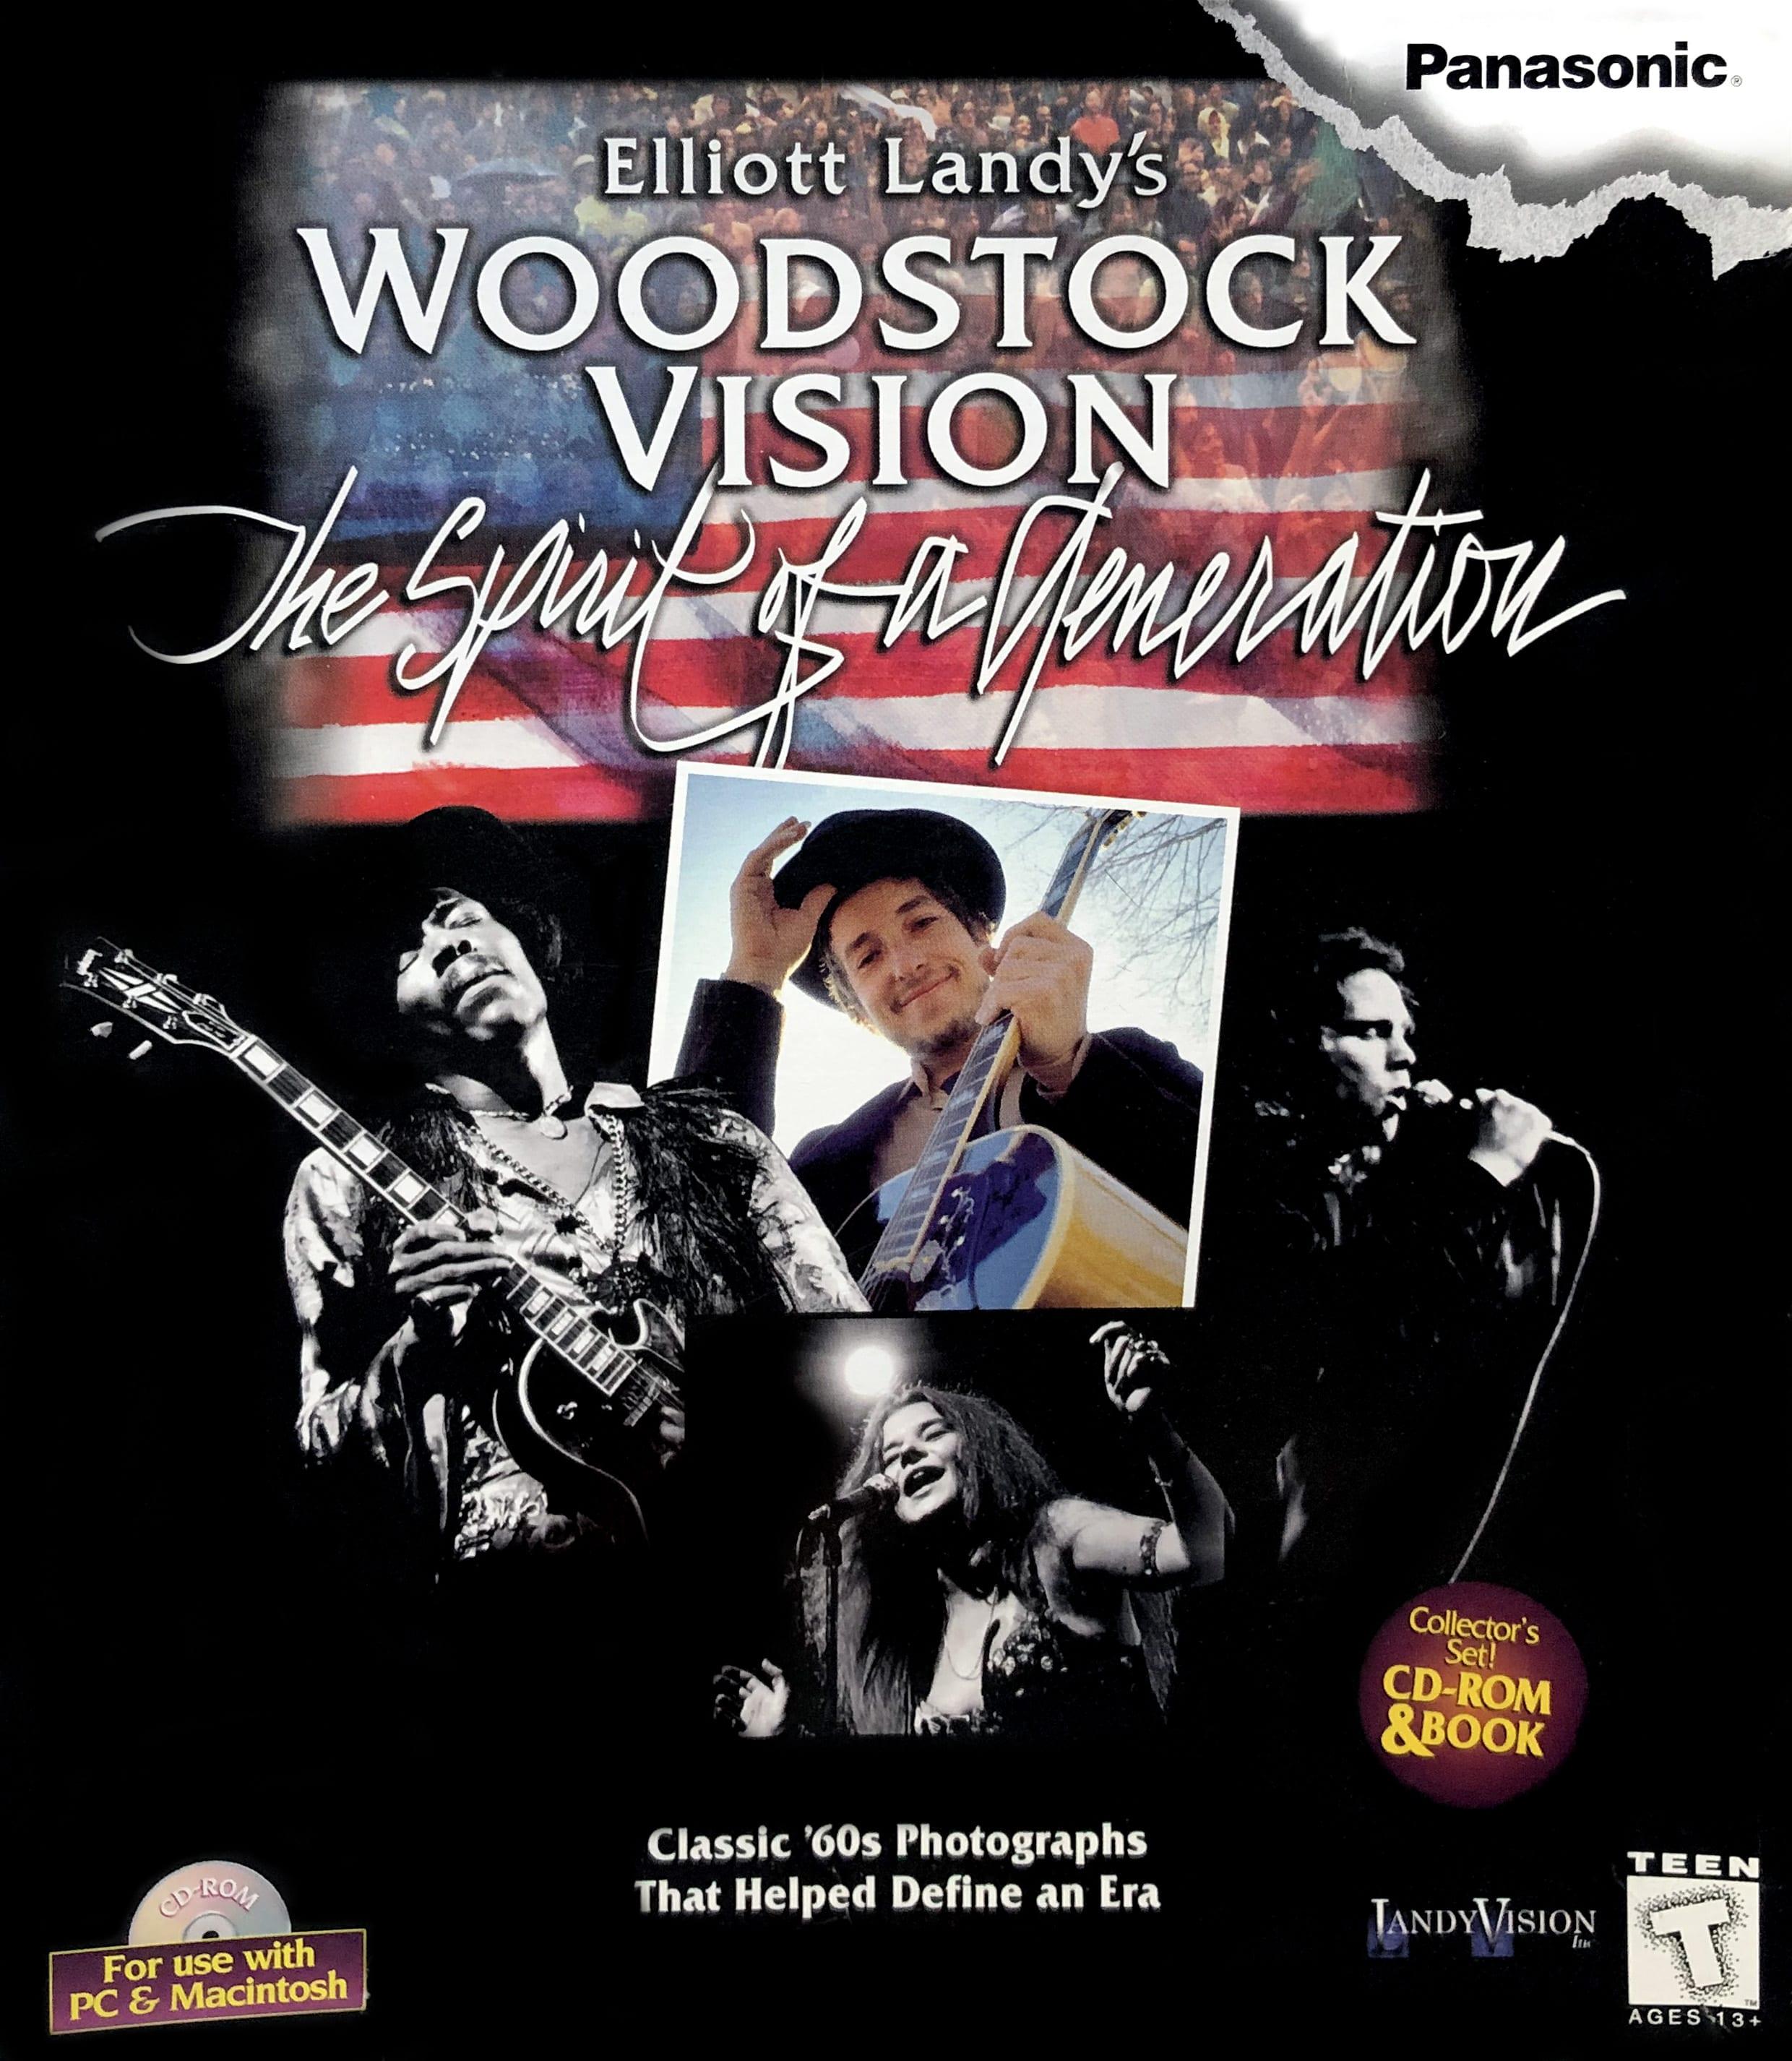 "Vintage copies of the Panasonic CD-ROM box set, ""Elliott Landy's Woodstock Vision, The Spirit of a Generation"